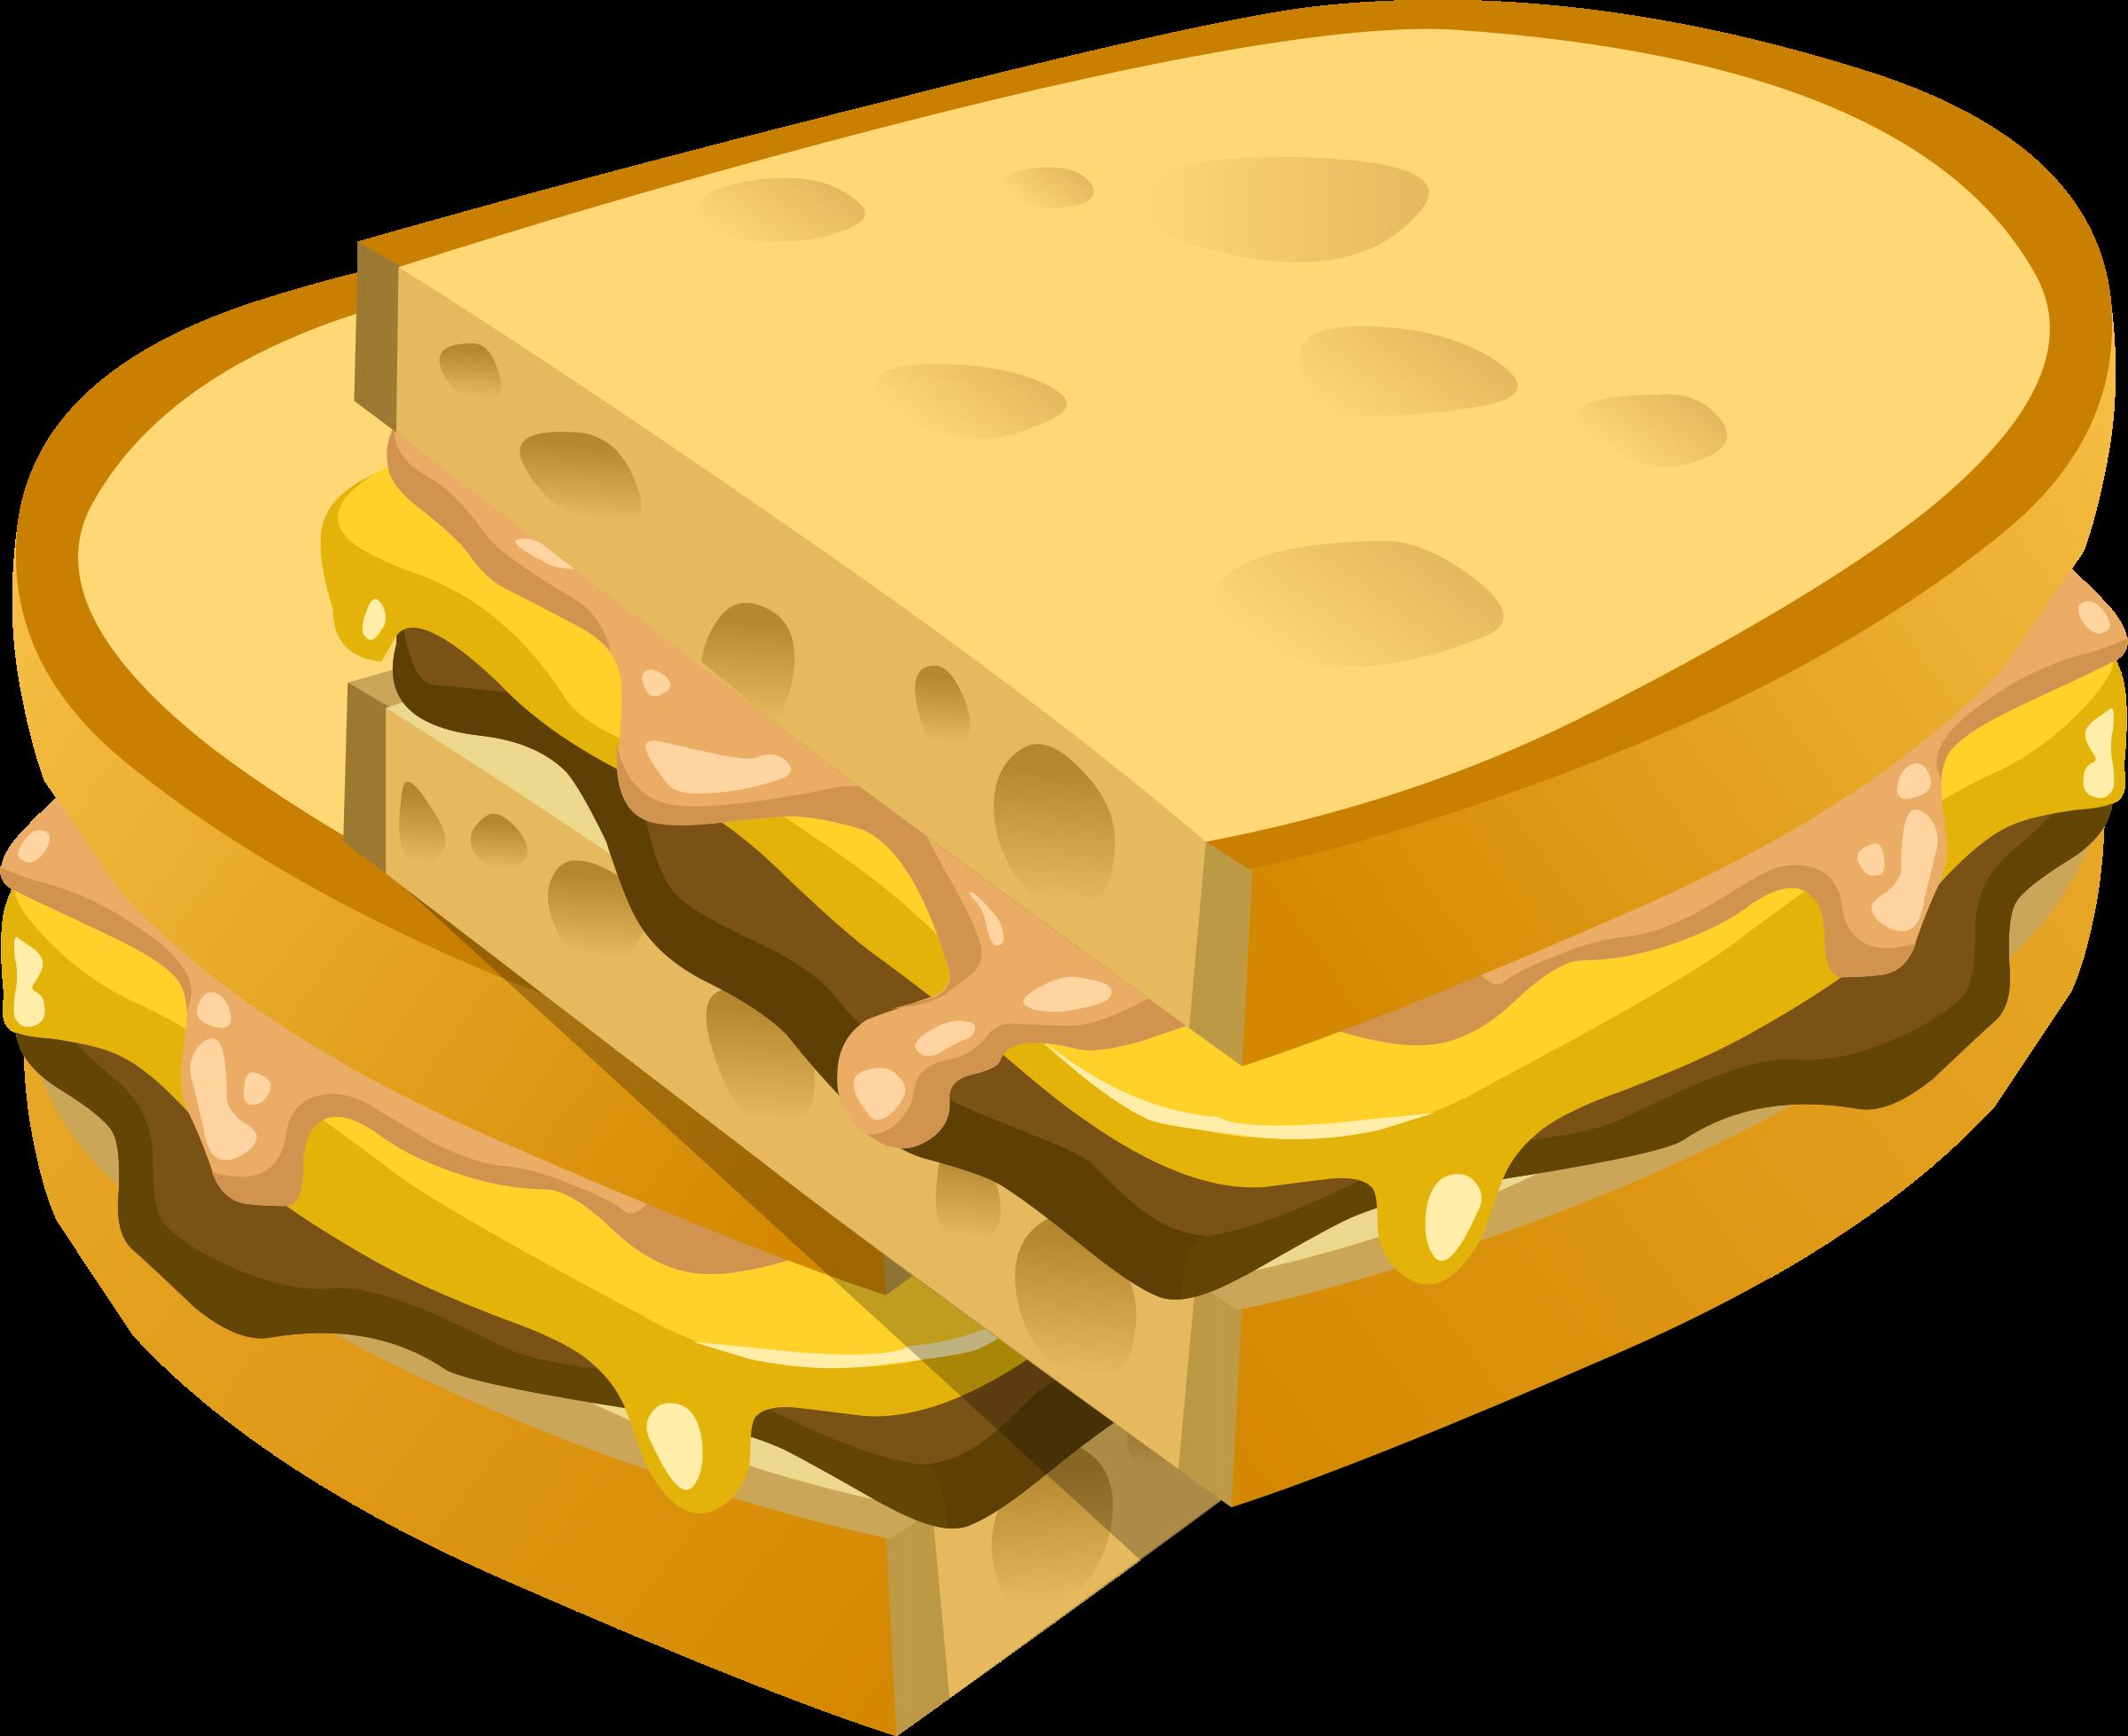 Obvious panini big image. Clipart food sandwich